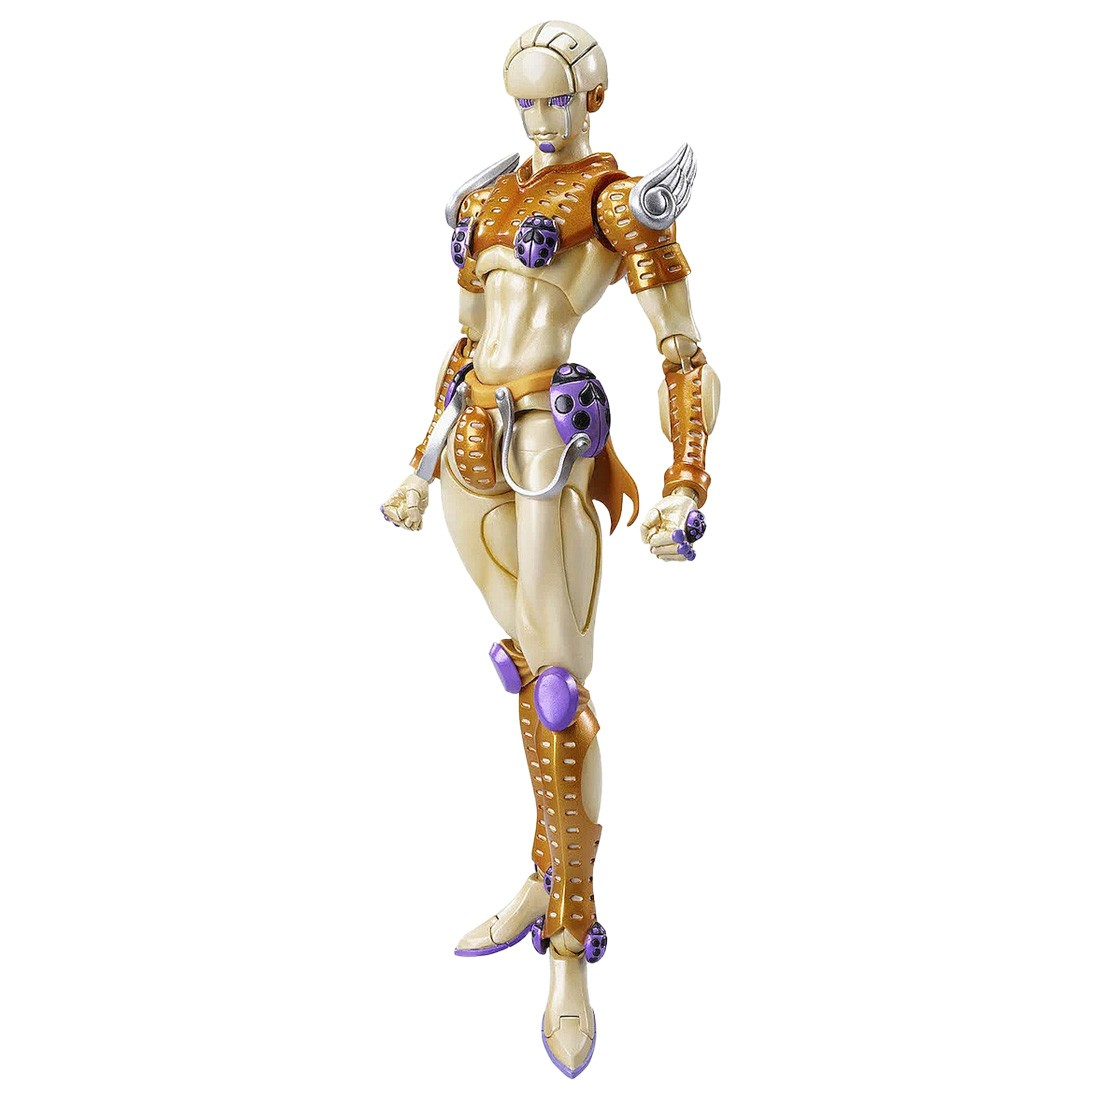 Medicos Super Action Statue JoJo's Bizarre Adventure Part 5 Golden Wind Gold Experience Chozokado Figure Re-Run (gold)